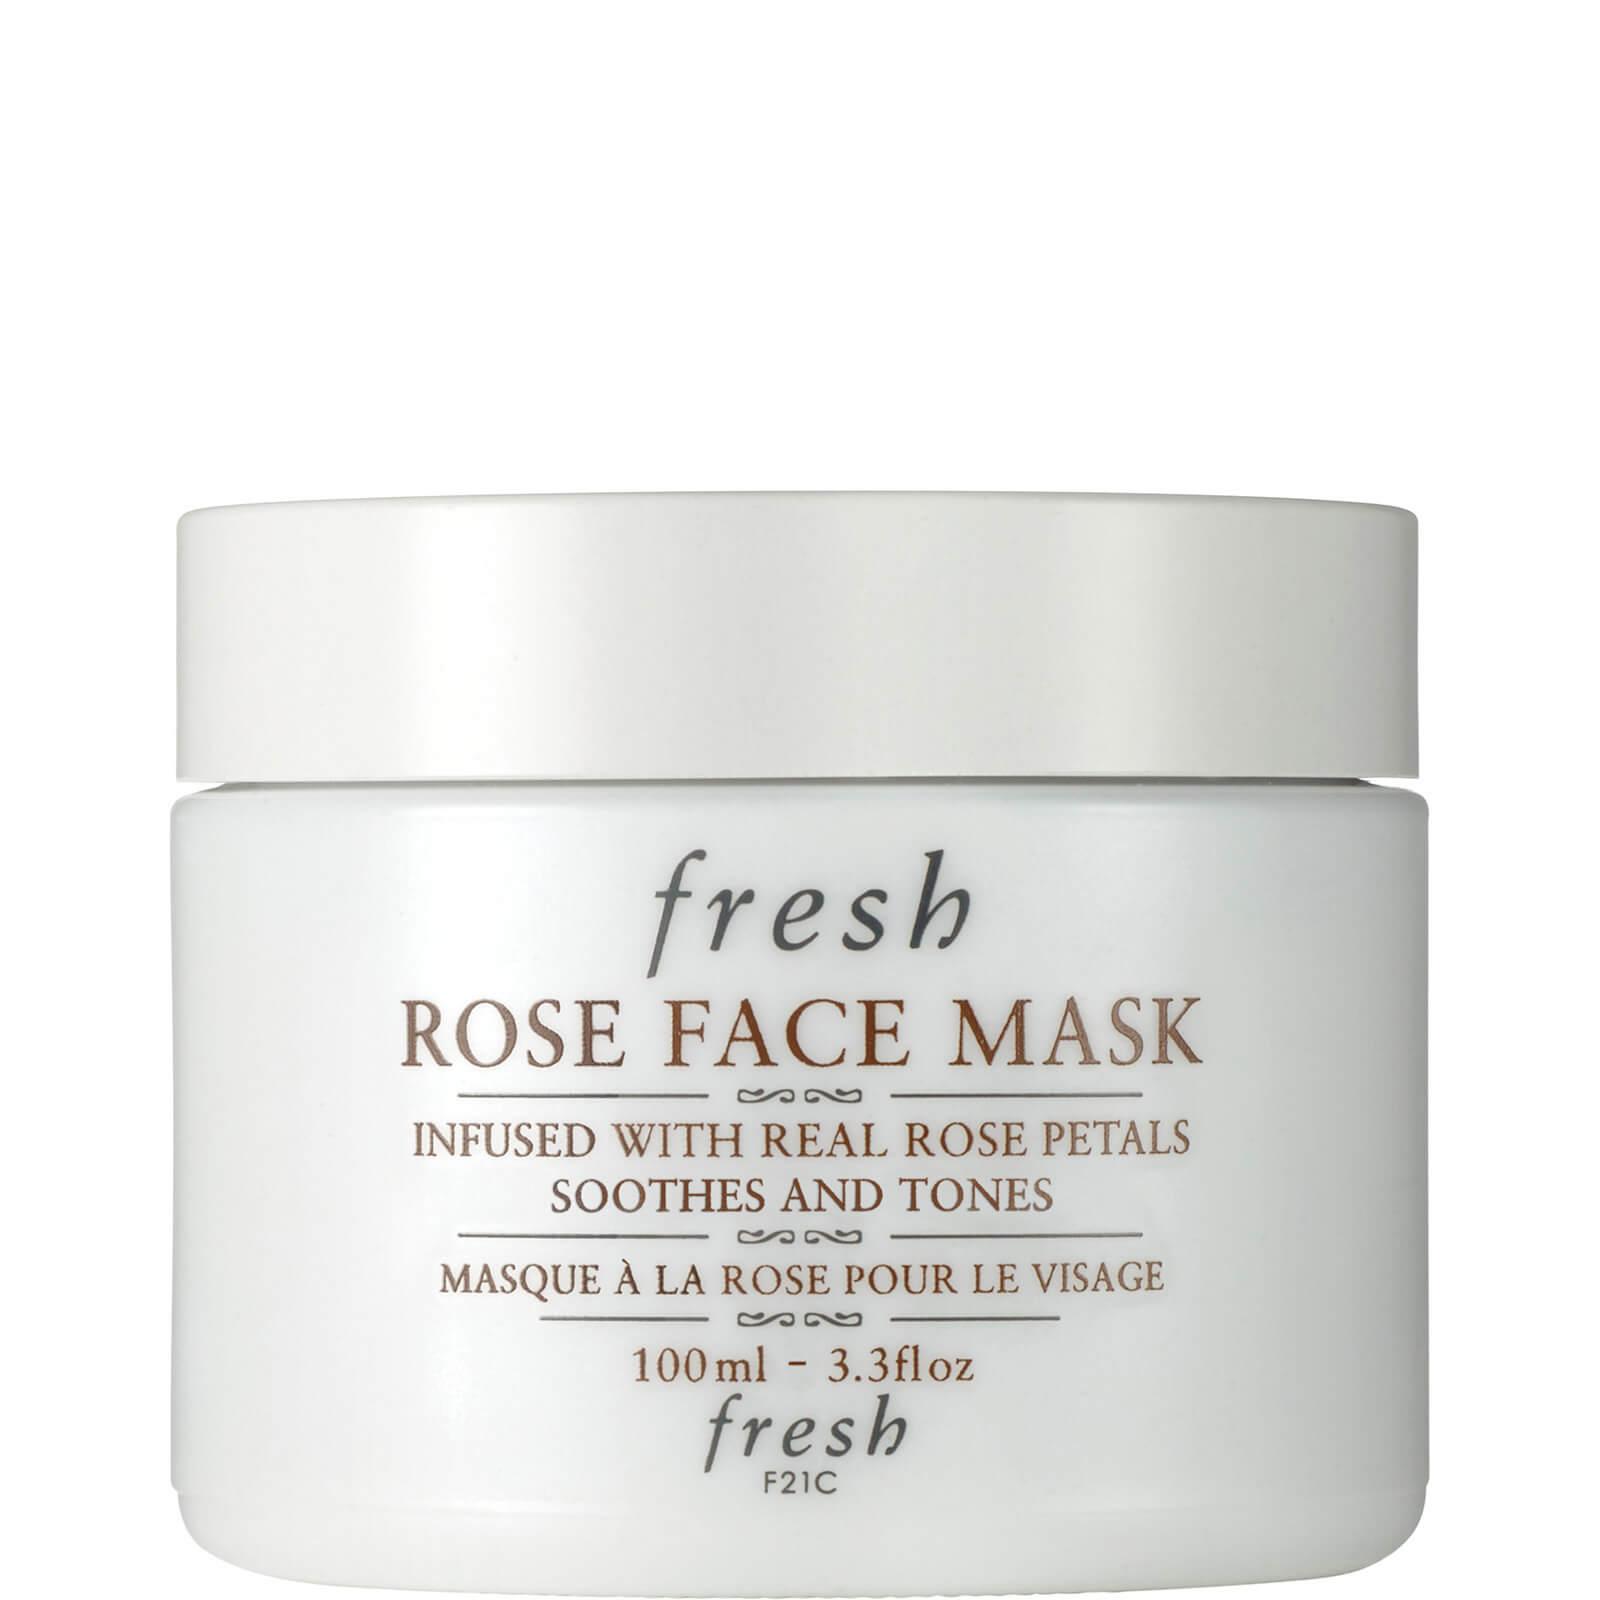 Купить Fresh Rose Face Mask (Various Sizes) - 100ml